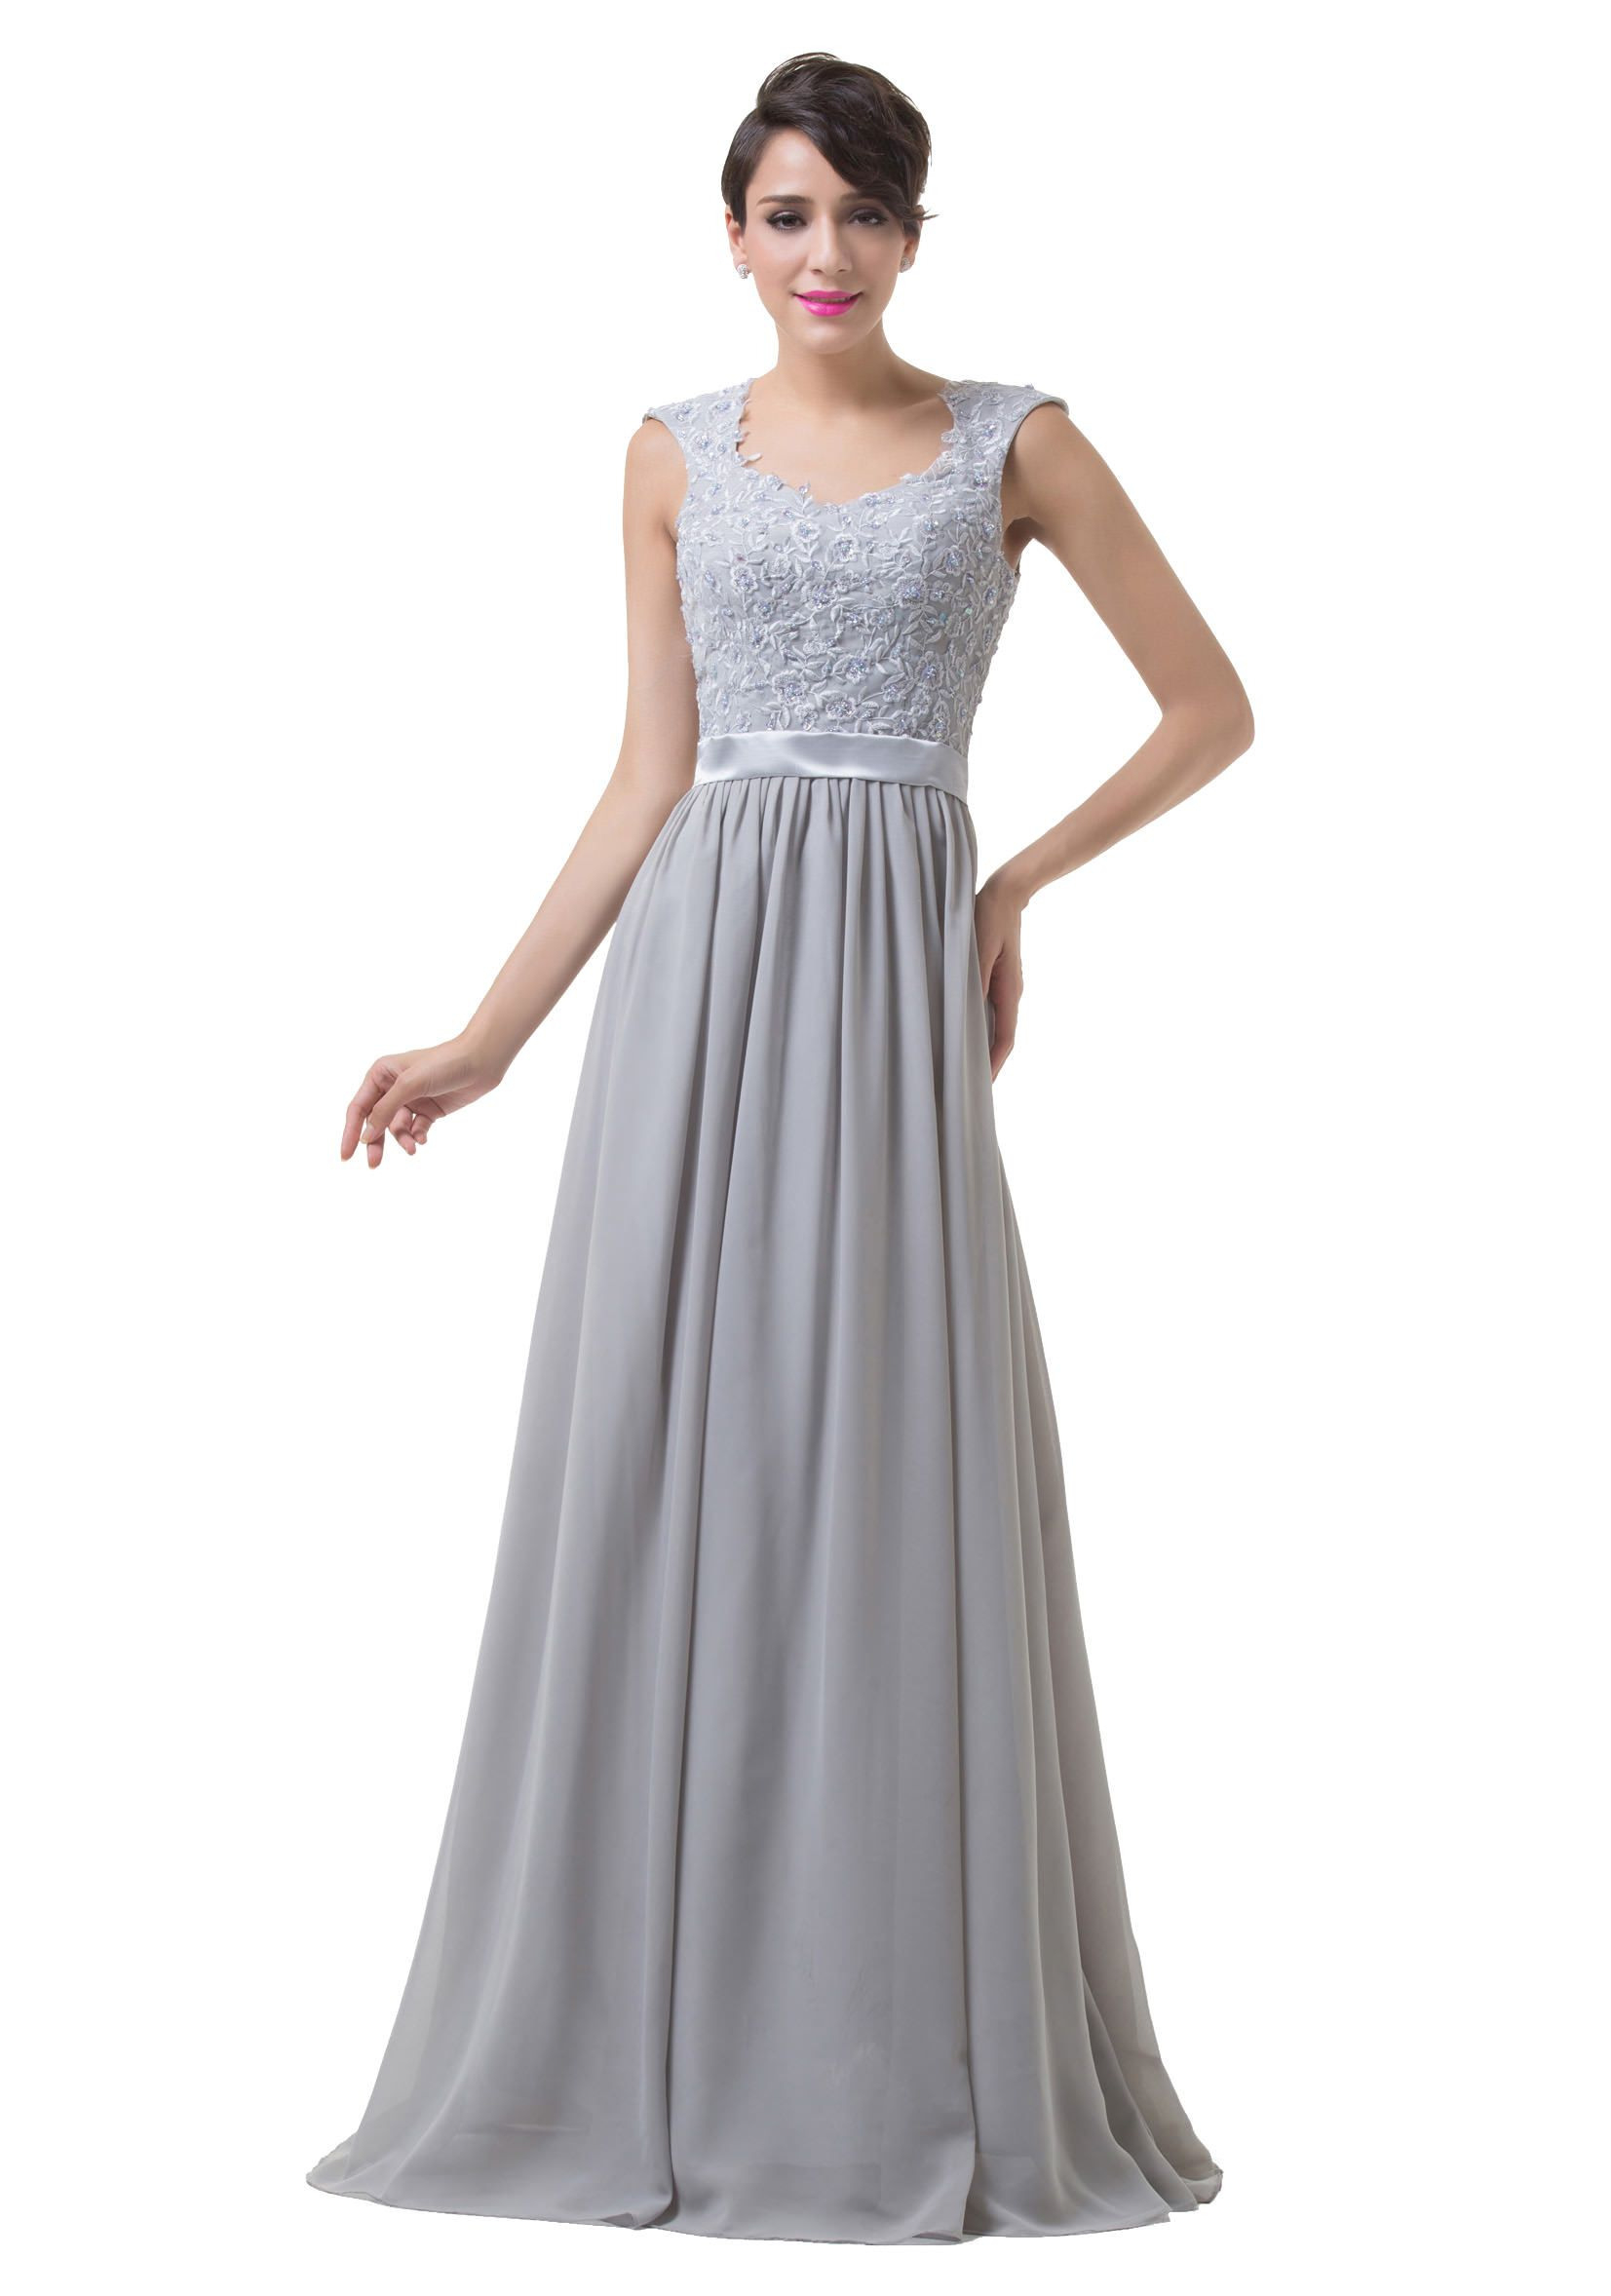 Abend Wunderbar Abendkleid Grau Lang Stylish13 Erstaunlich Abendkleid Grau Lang für 2019